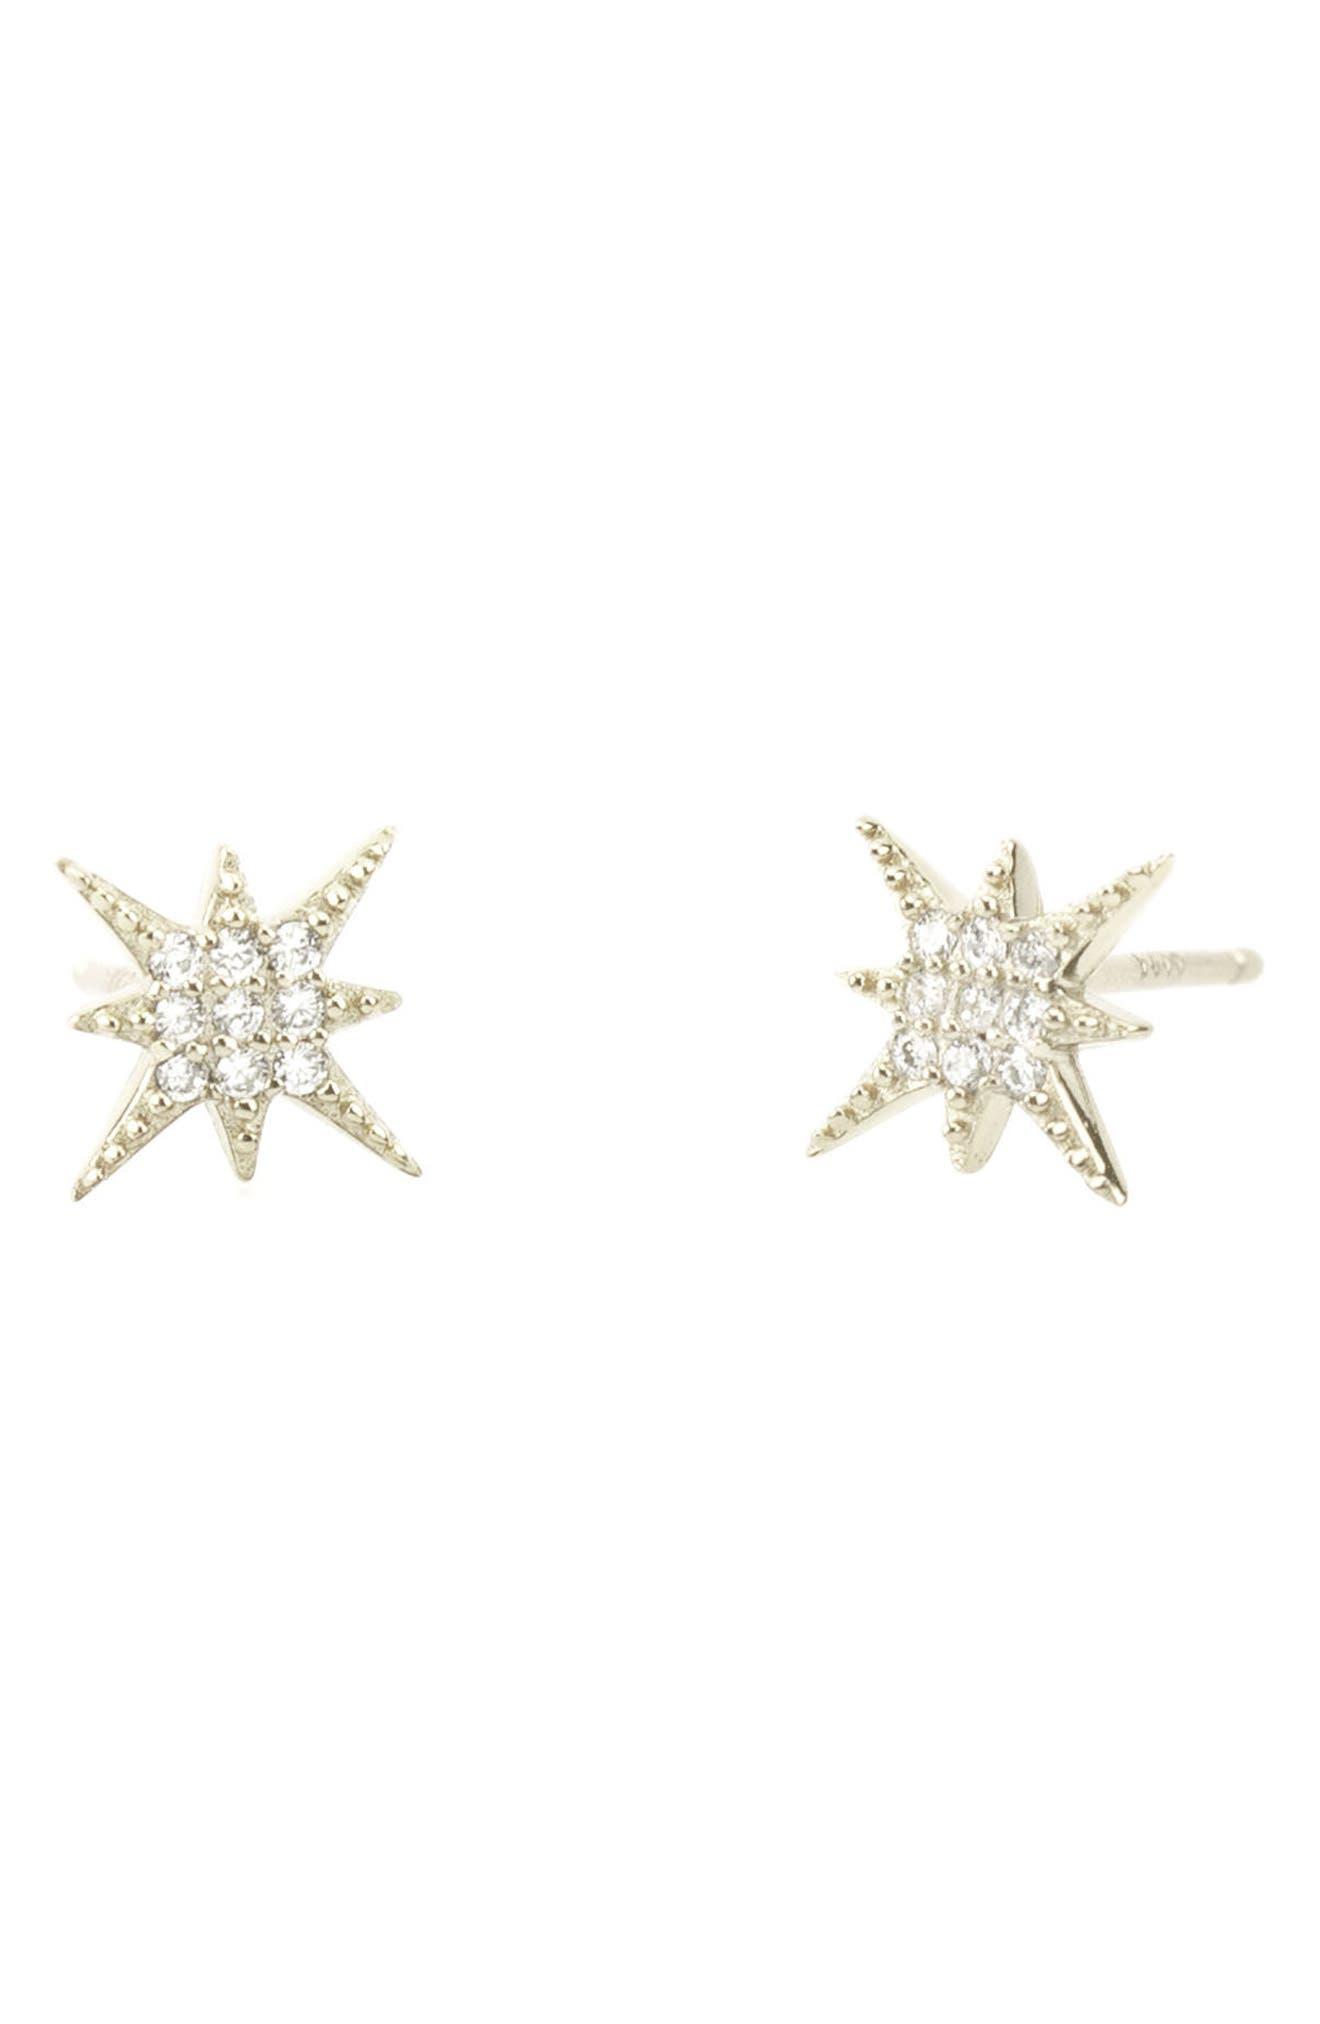 Pavé Starburst Stud Earrings,                             Main thumbnail 1, color,